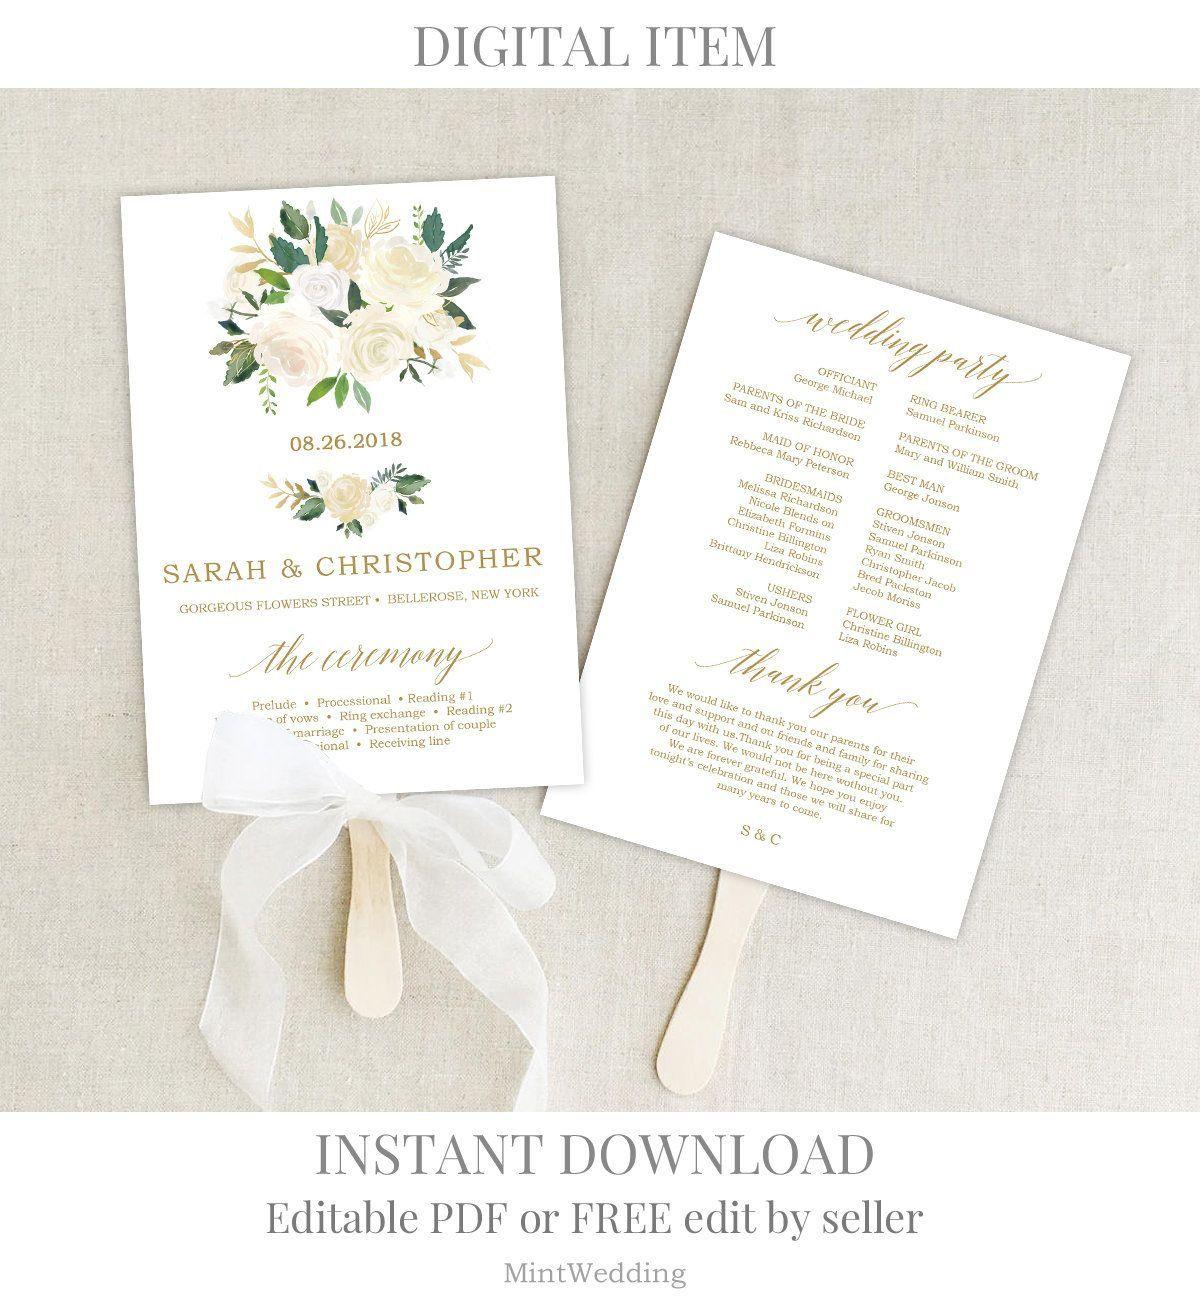 002 Sensational Free Printable Wedding Program Template Inspiration  Templates Microsoft Word IndianFull